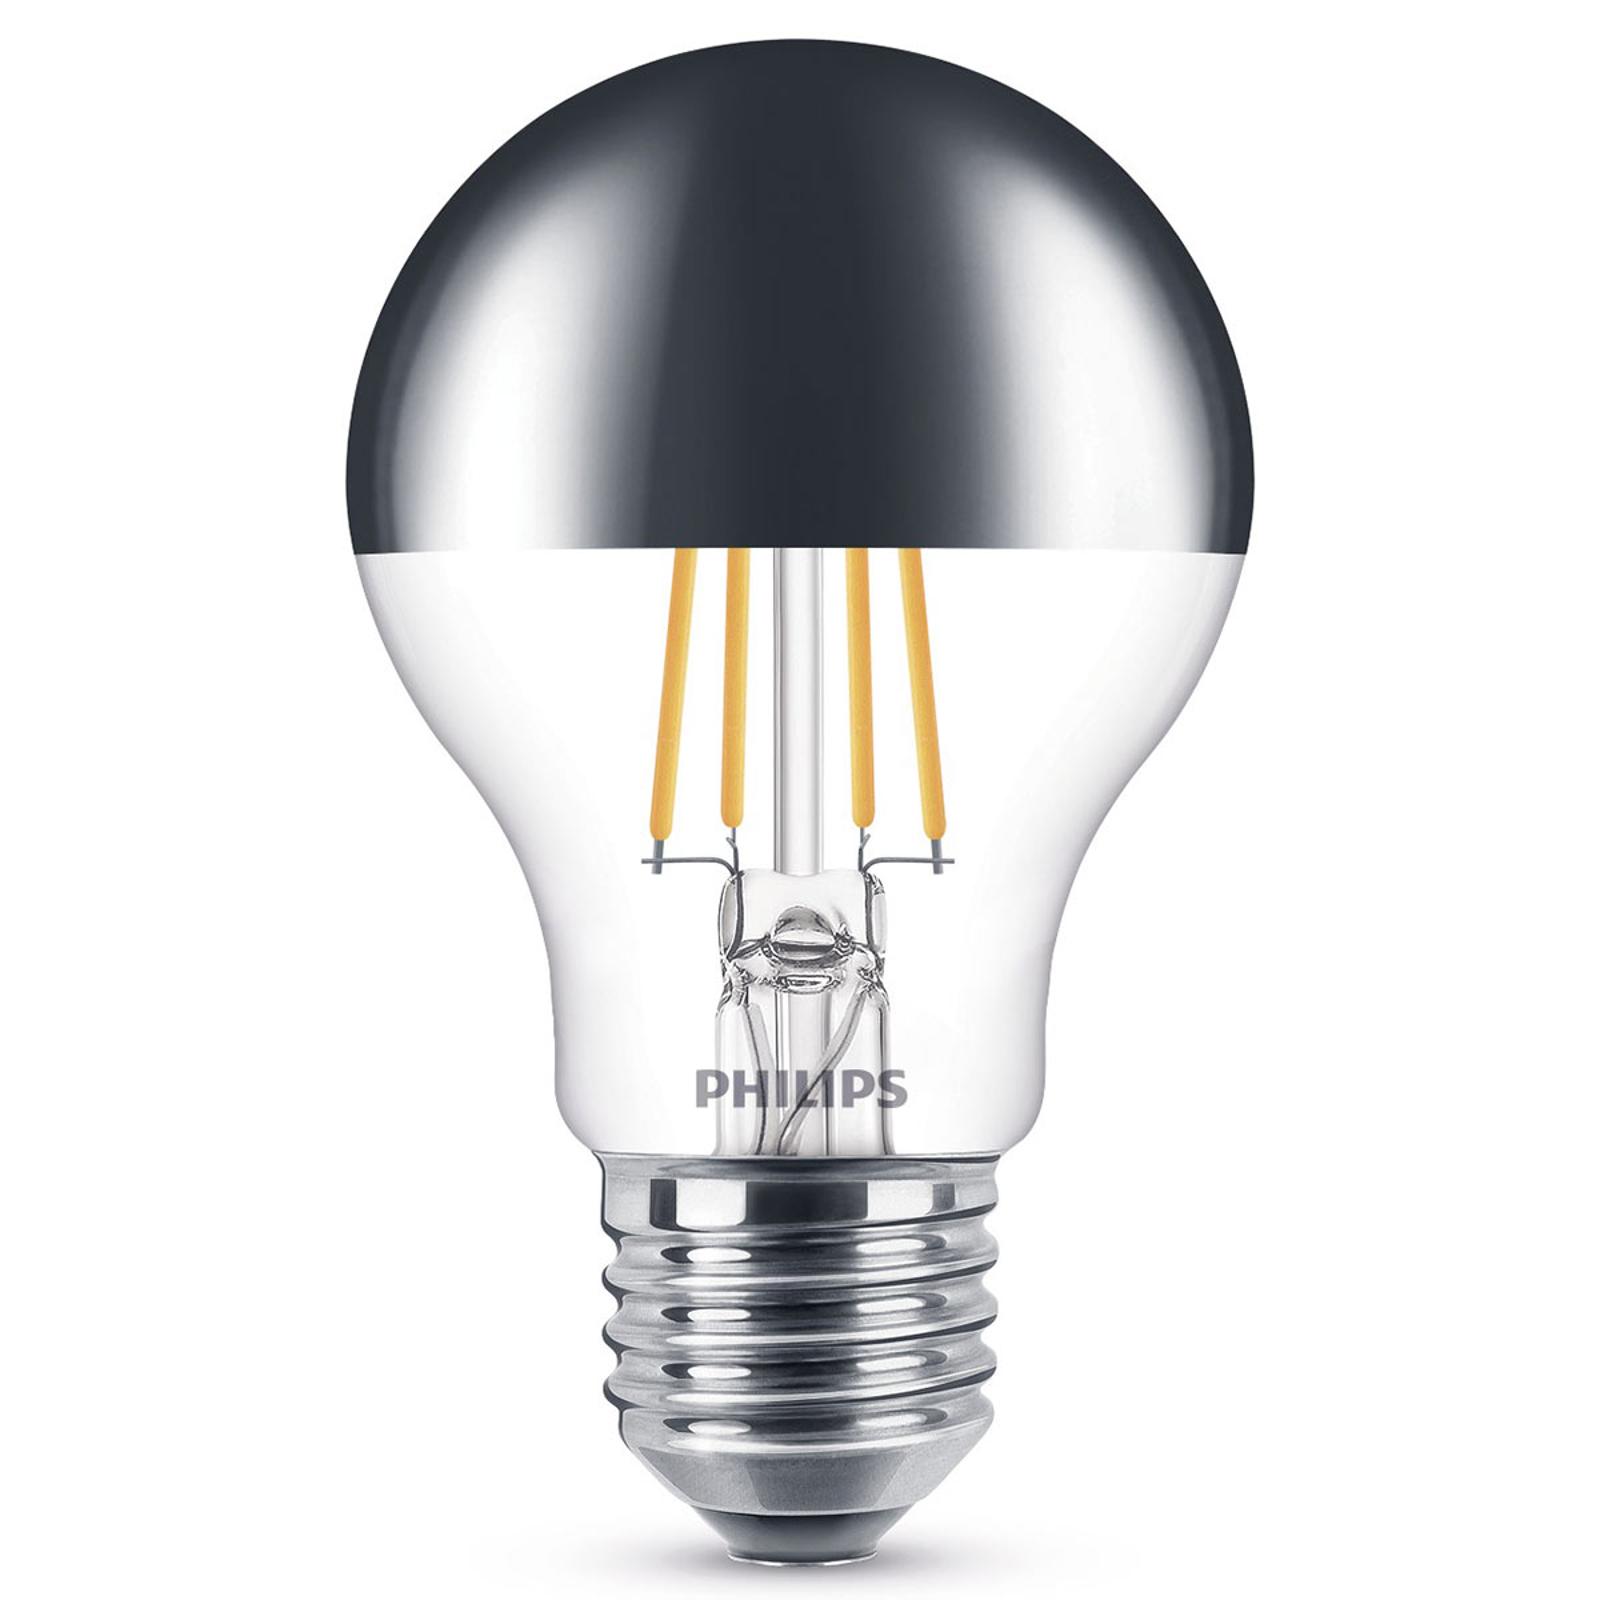 Philips E27 LED-Kopfspiegellampe 7,2W warmweiß